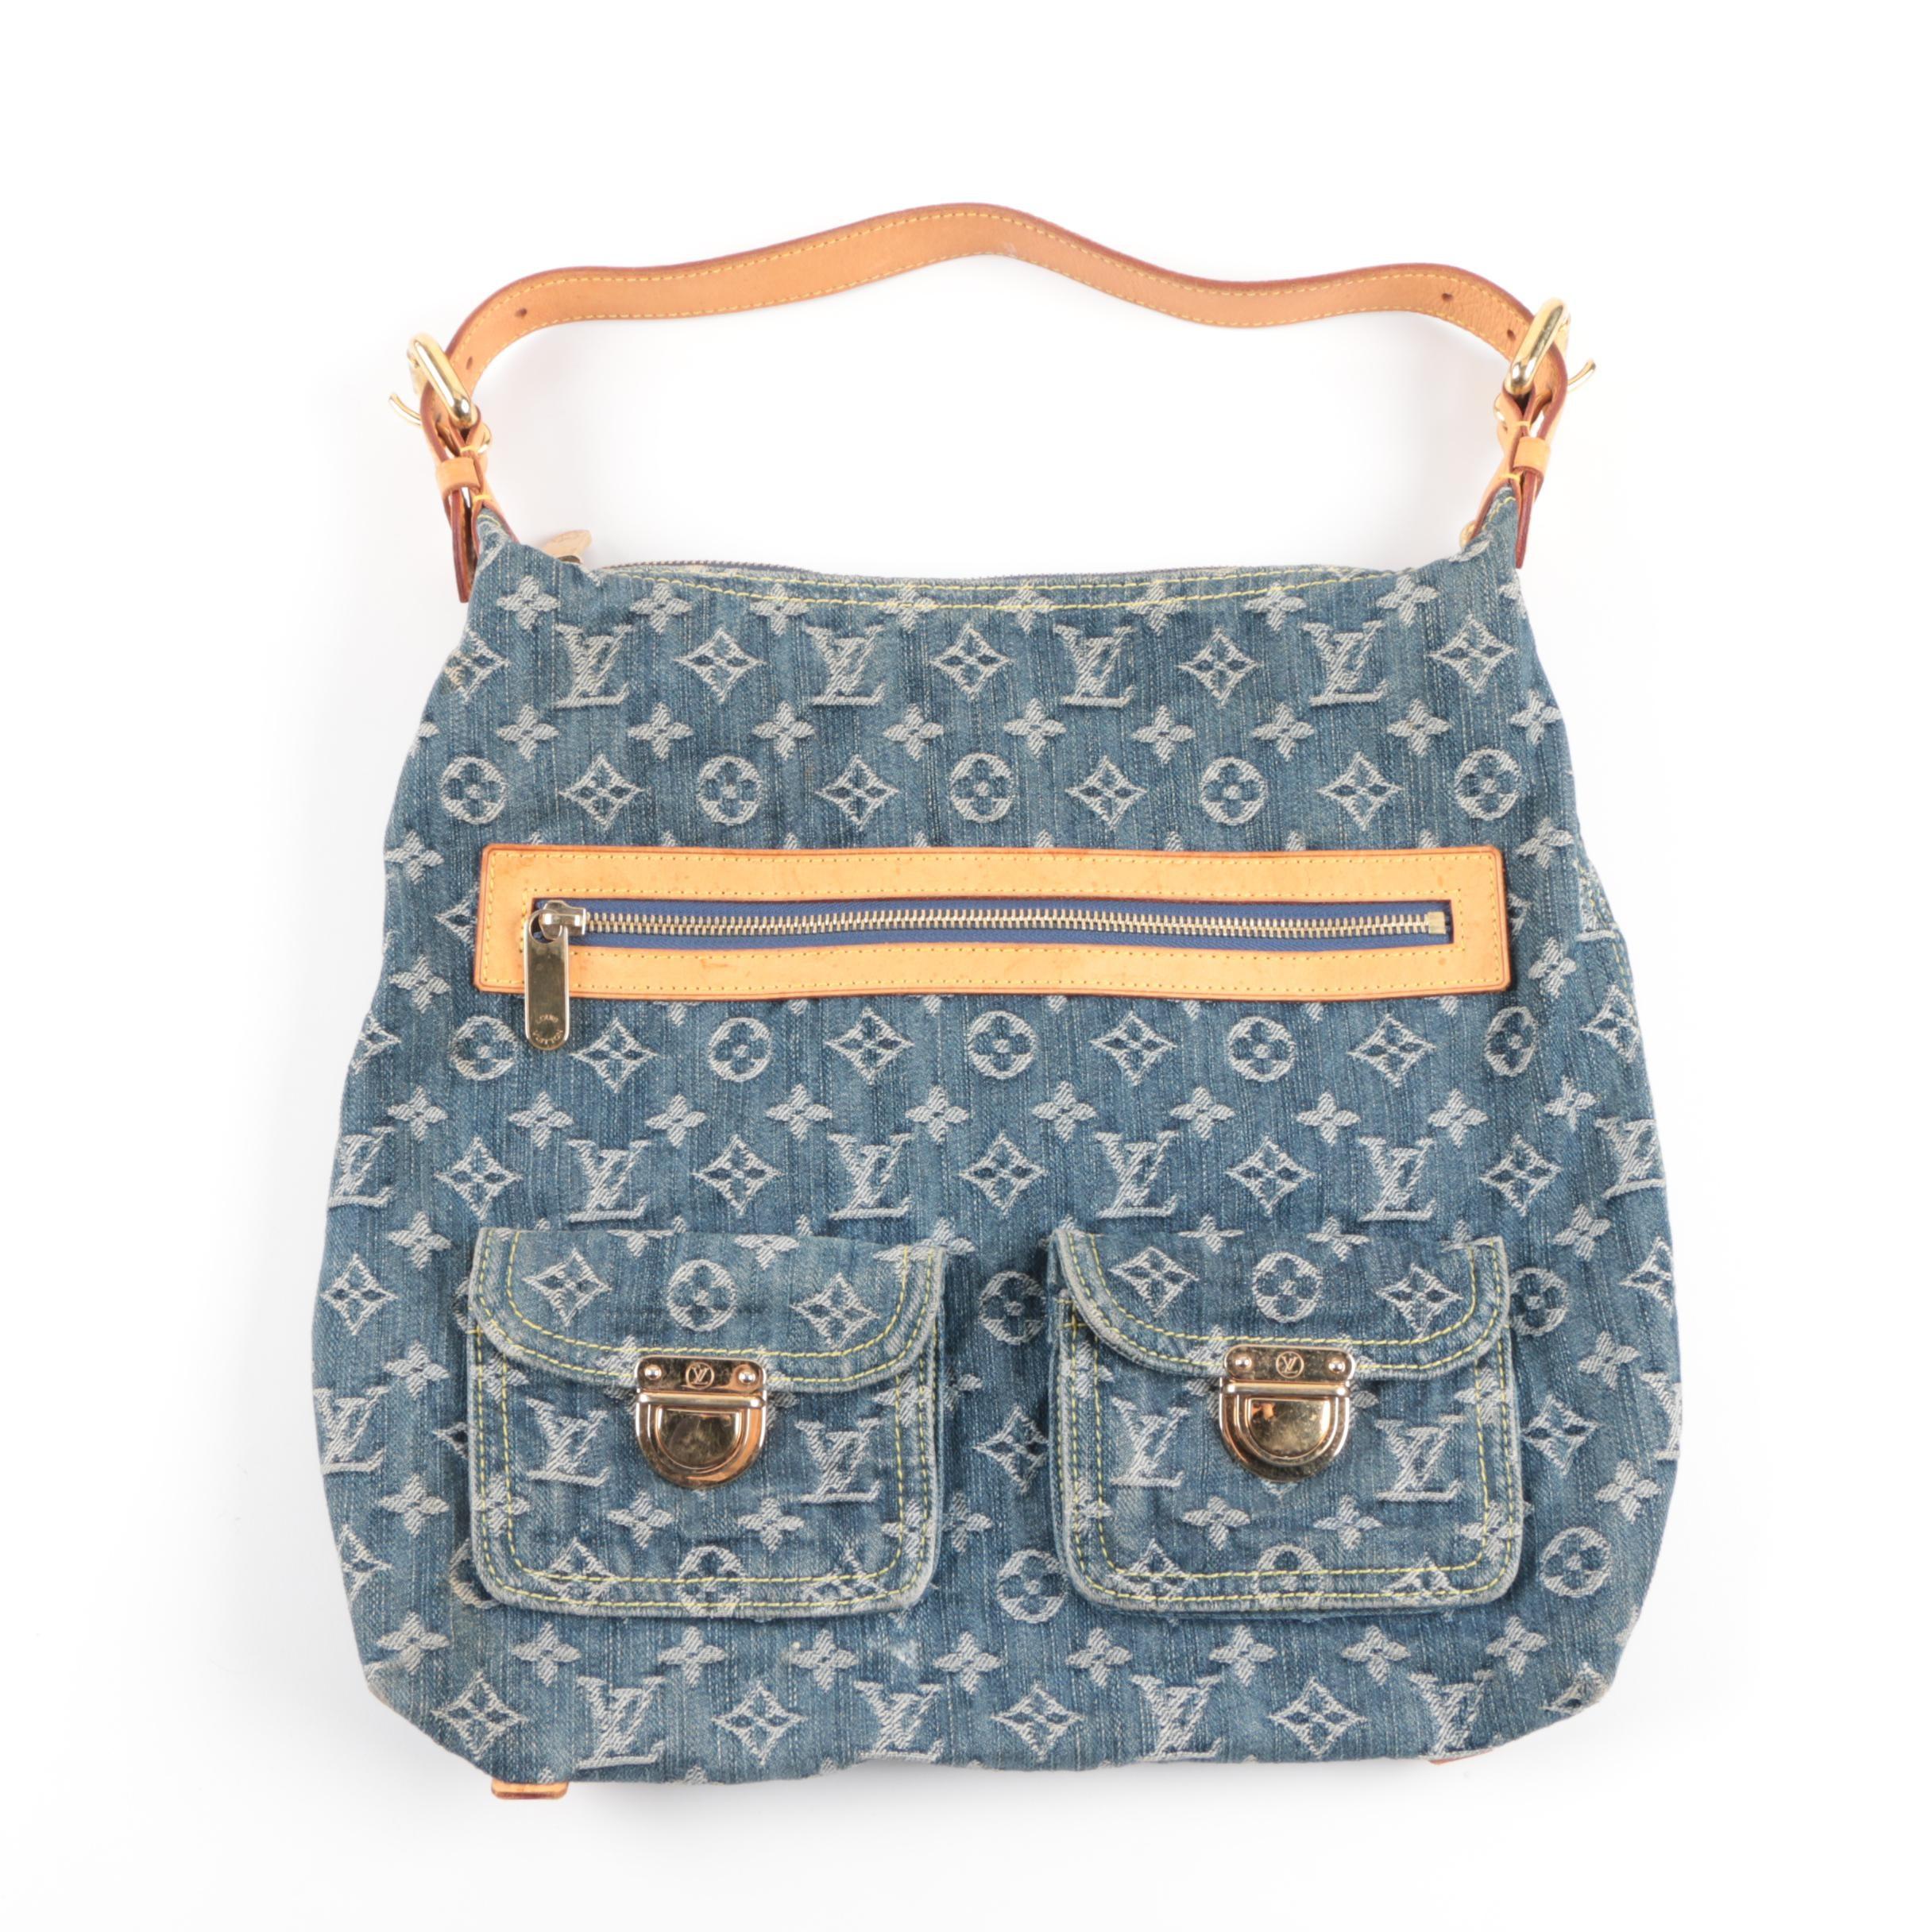 Louis Vuitton Blue Monogram Denim Baggy GM Bag